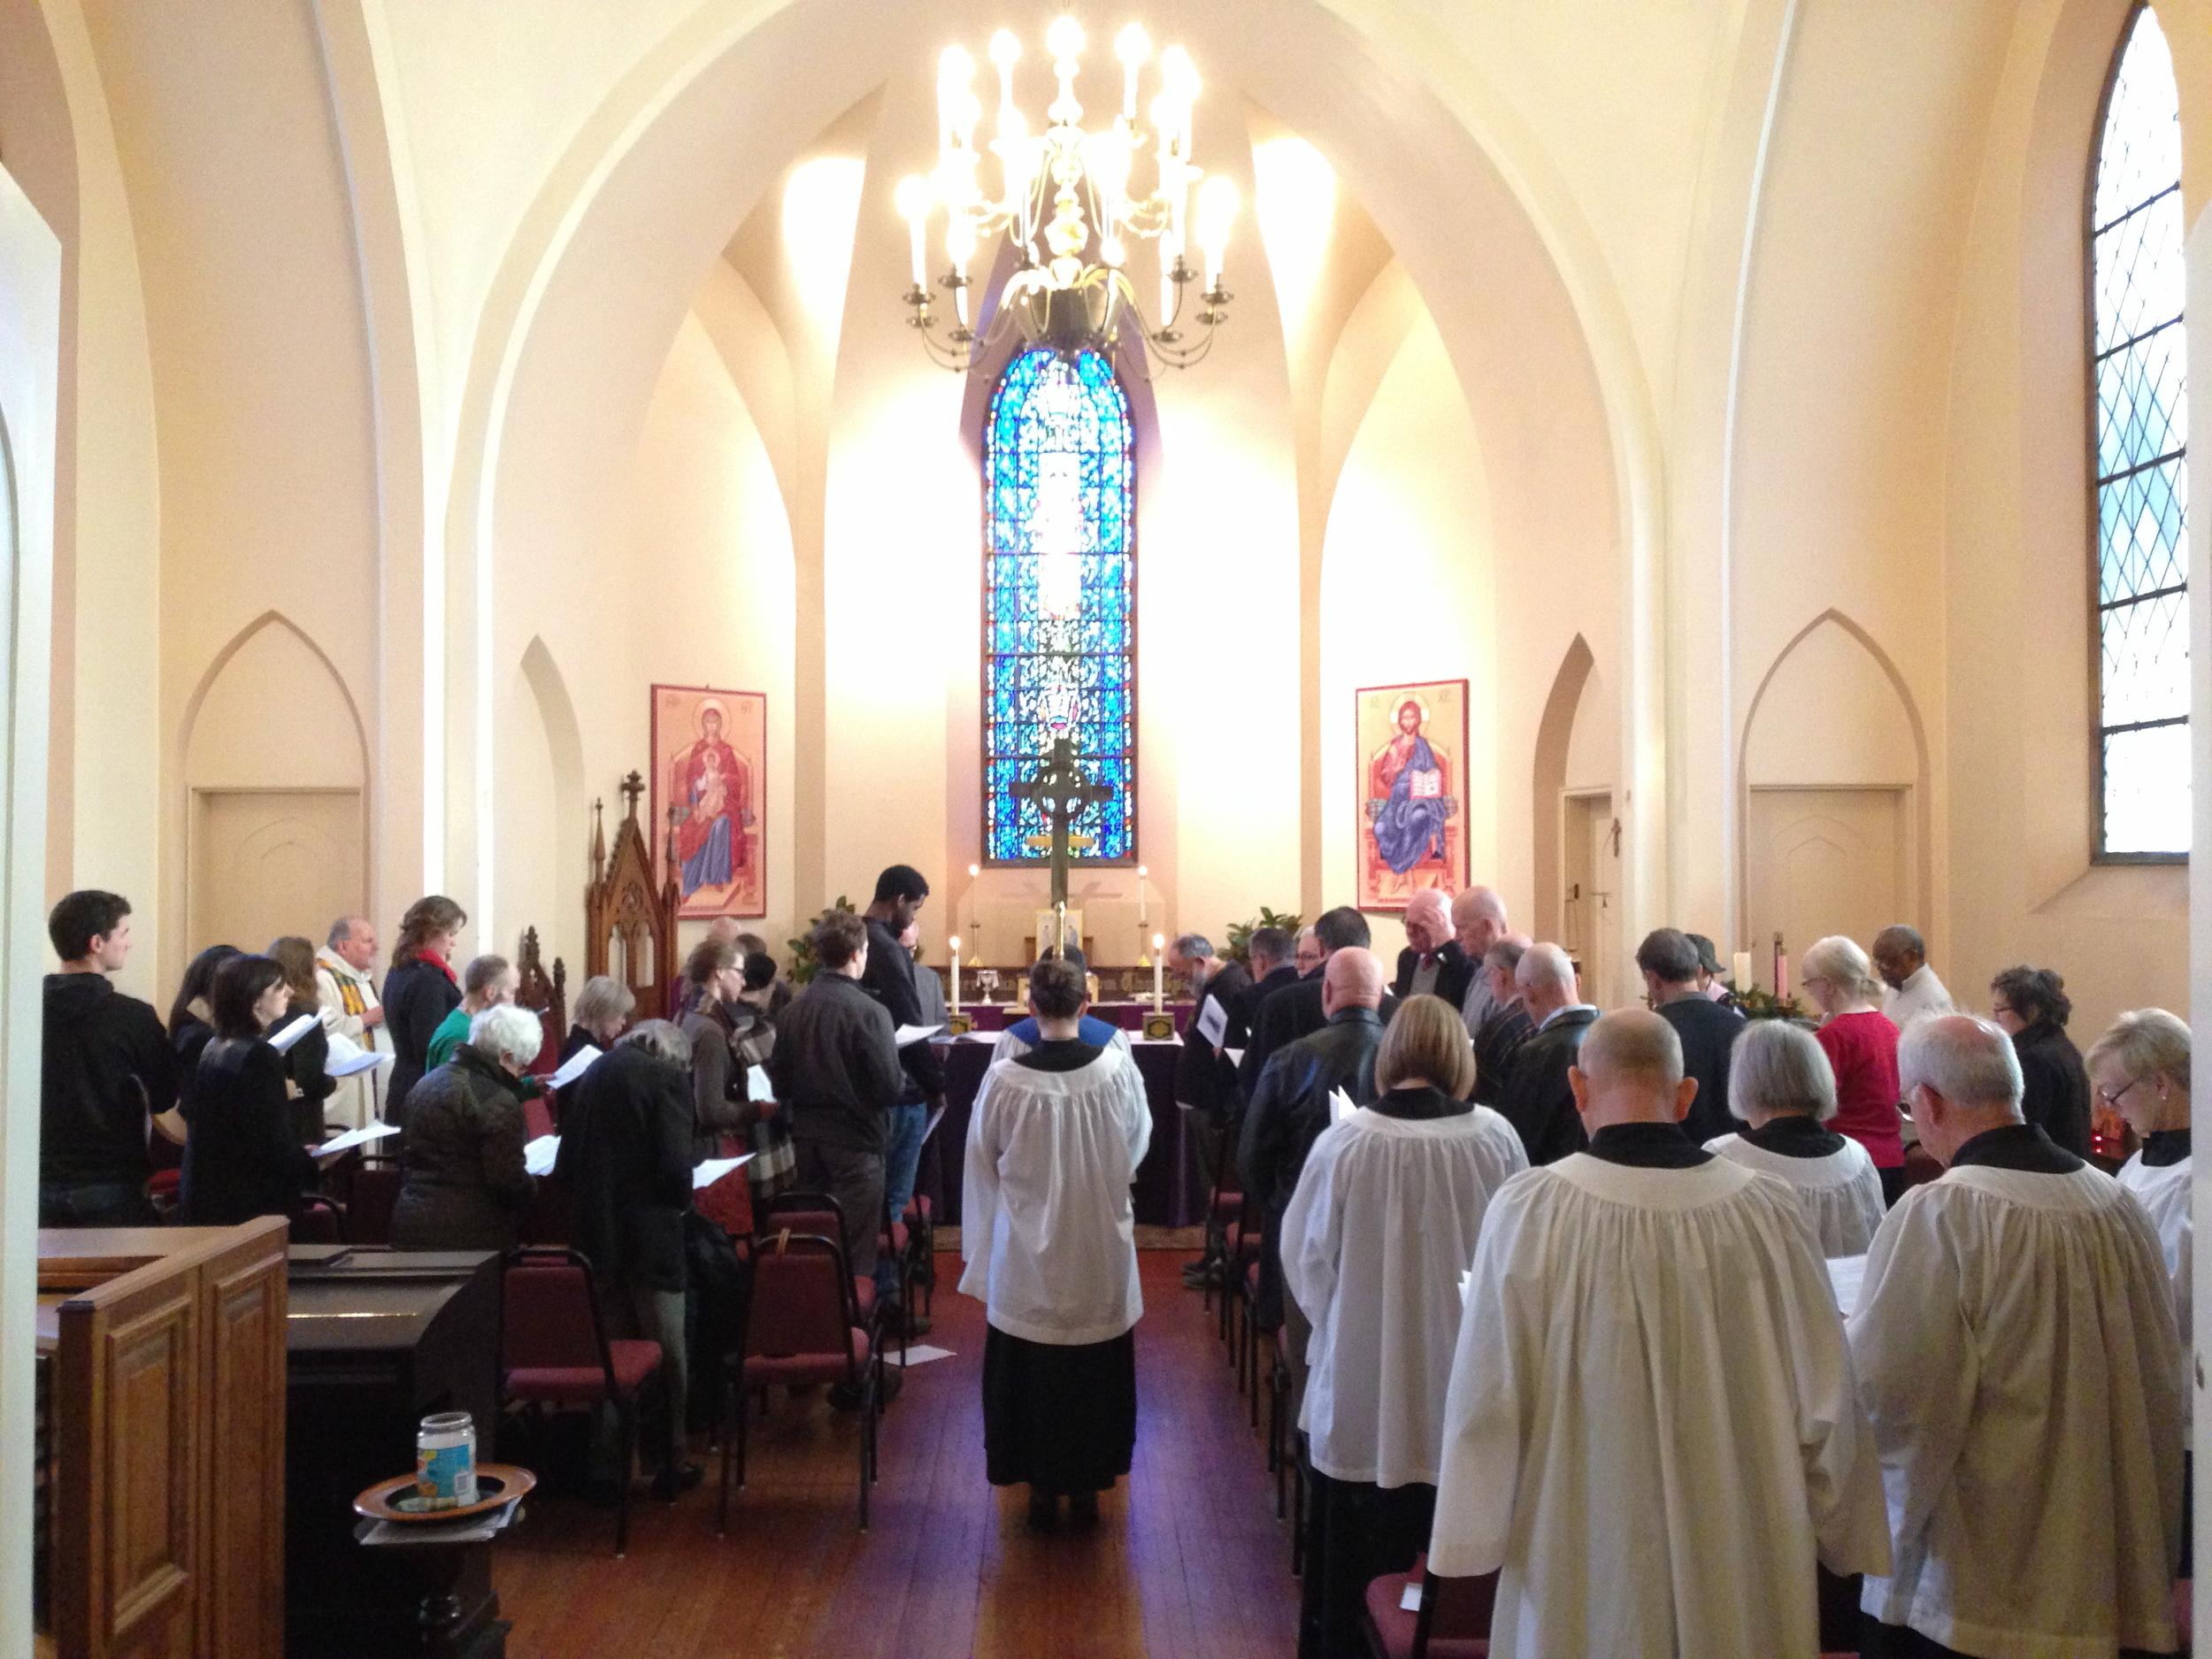 Congregation singing in unison.